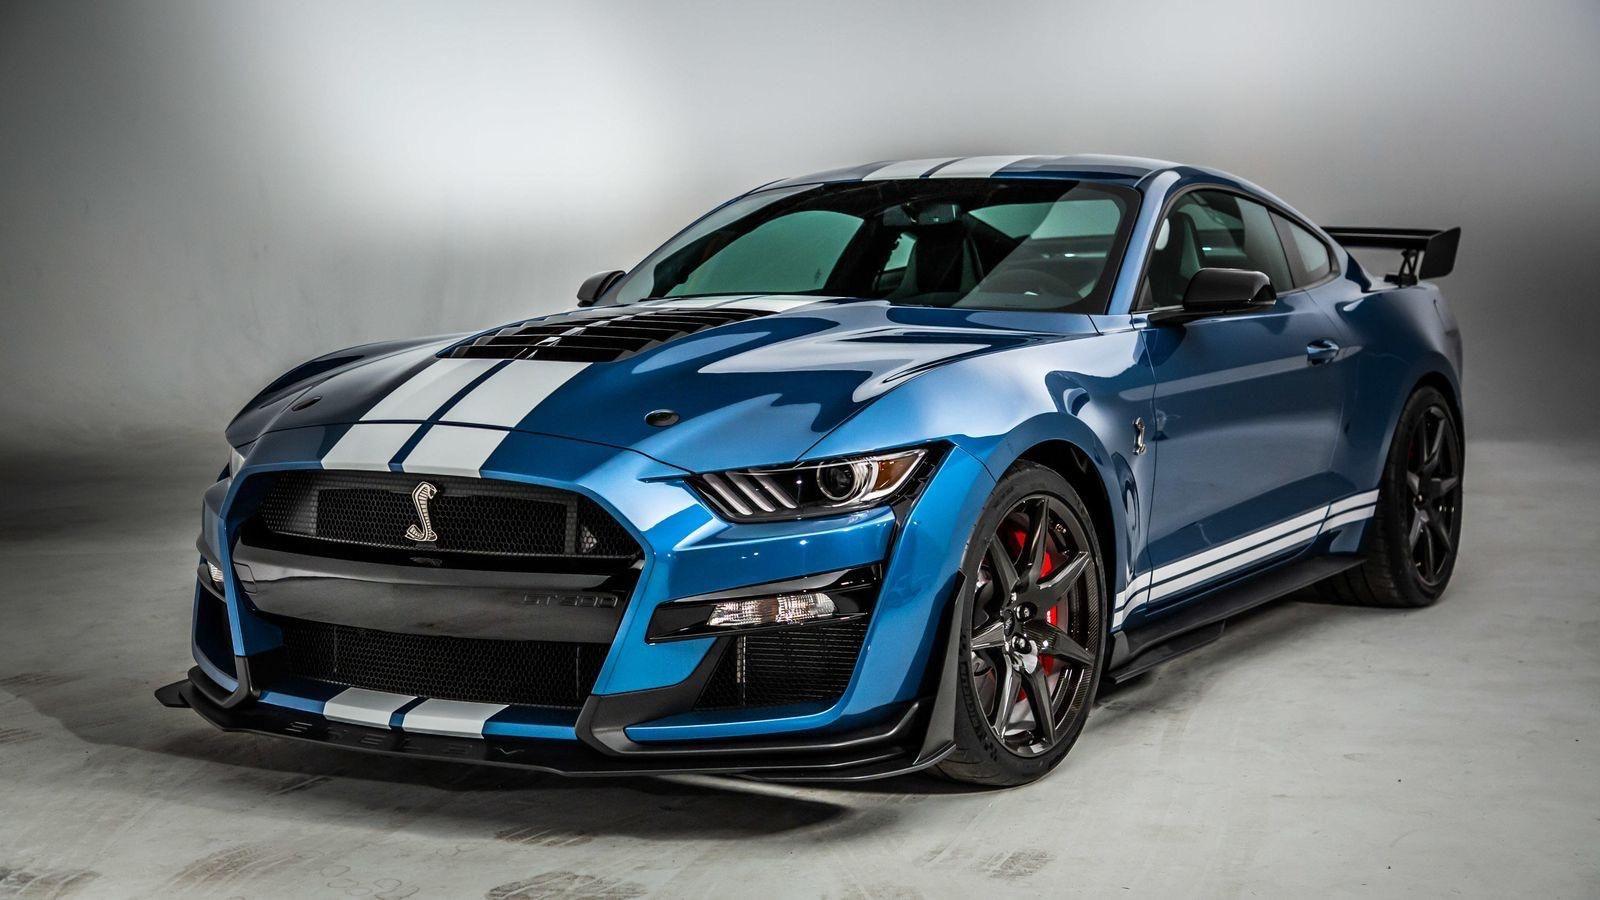 2021 Mustang Gt500 History